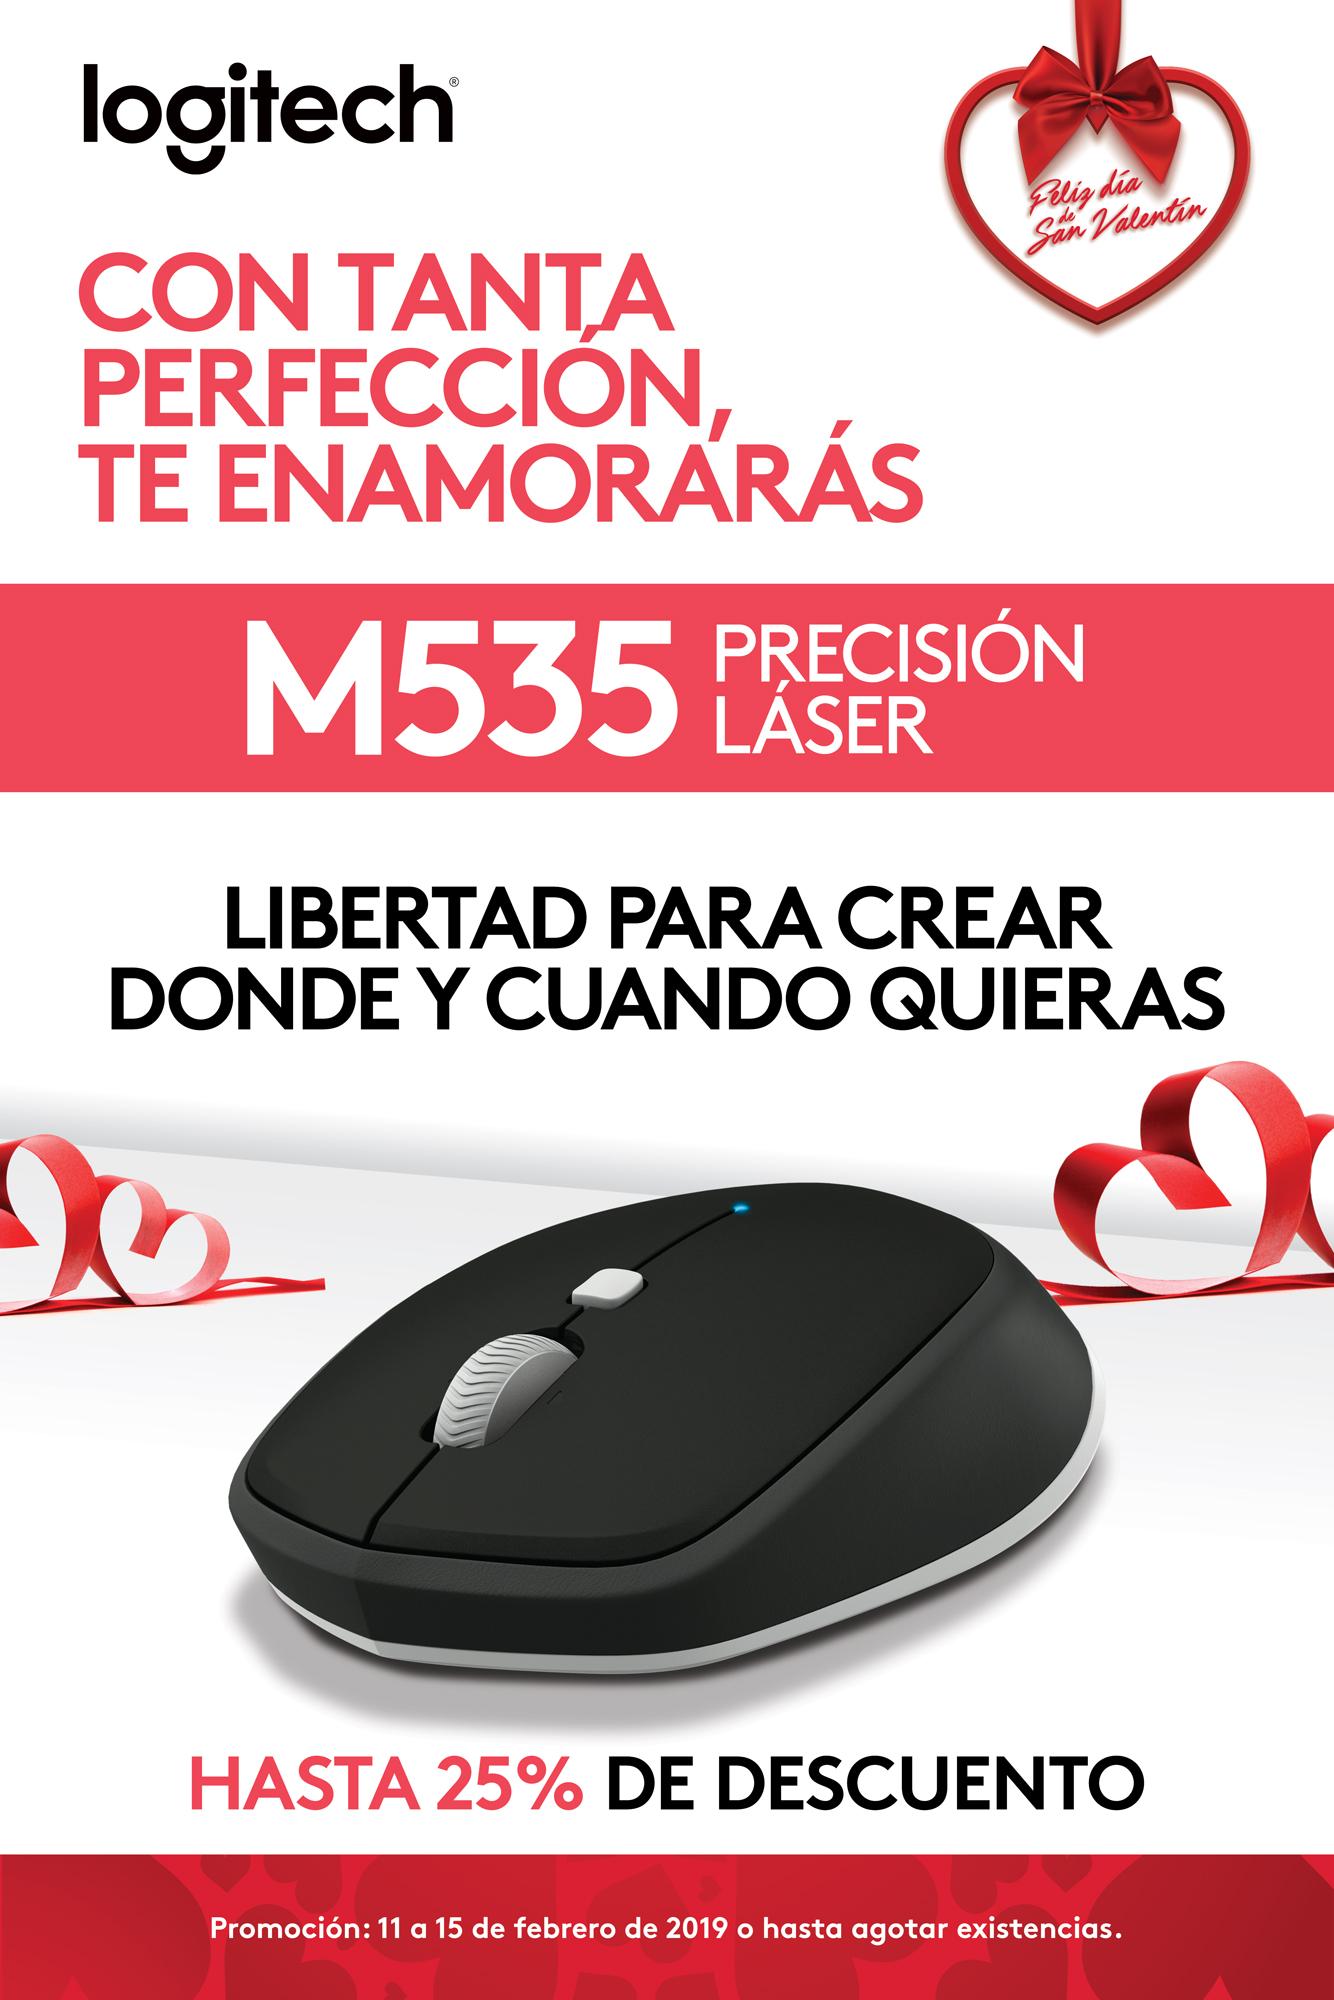 Promo M535 - Mouse láser - Logitech